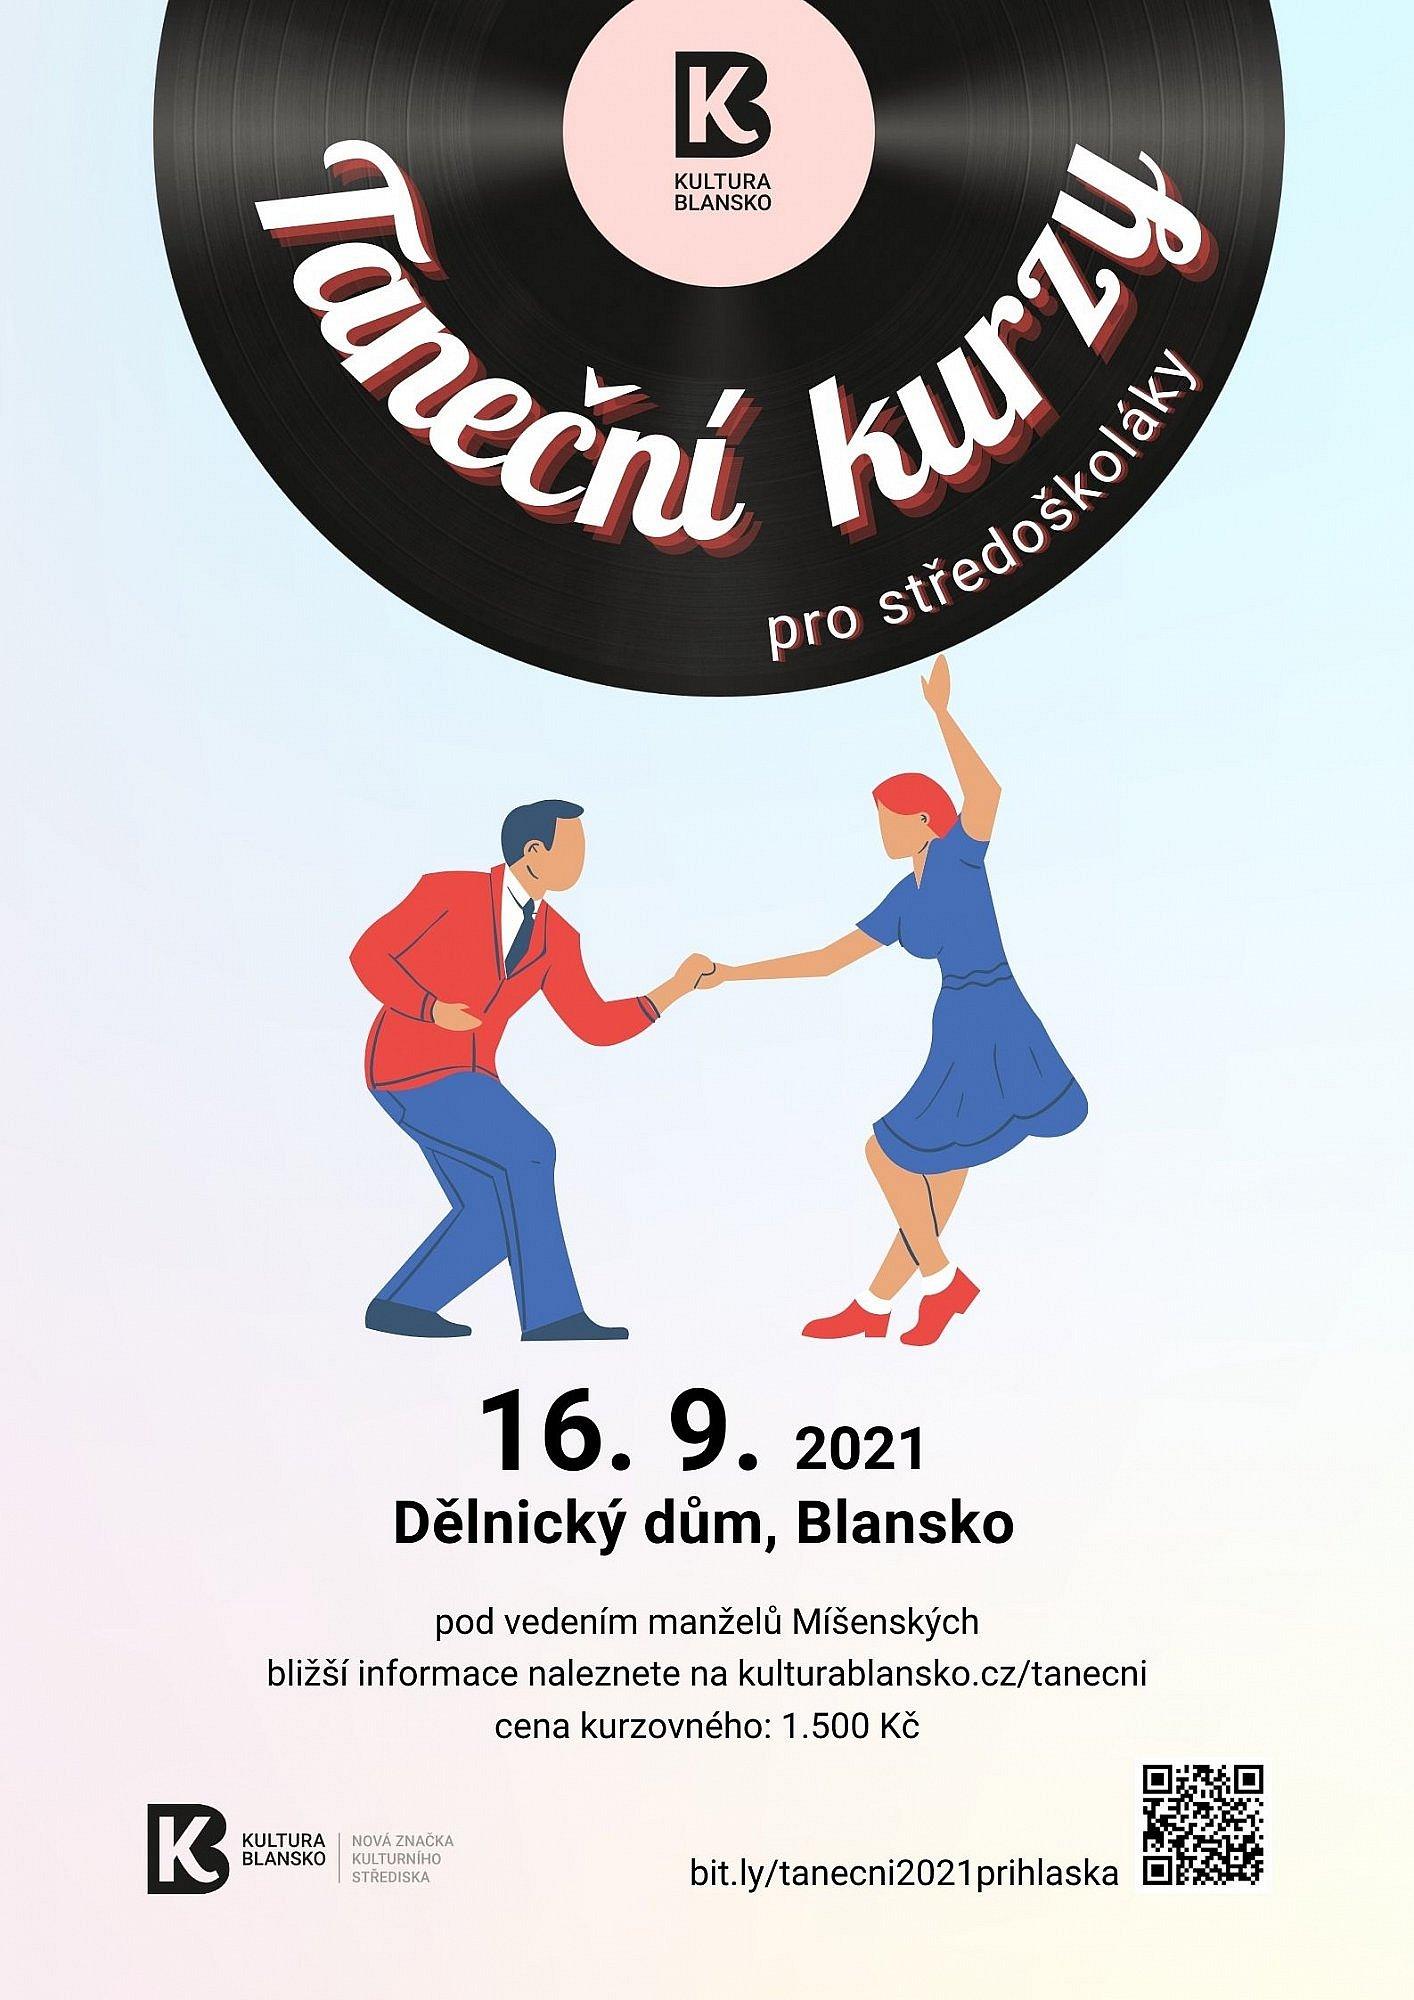 tanecni-46696.jpg